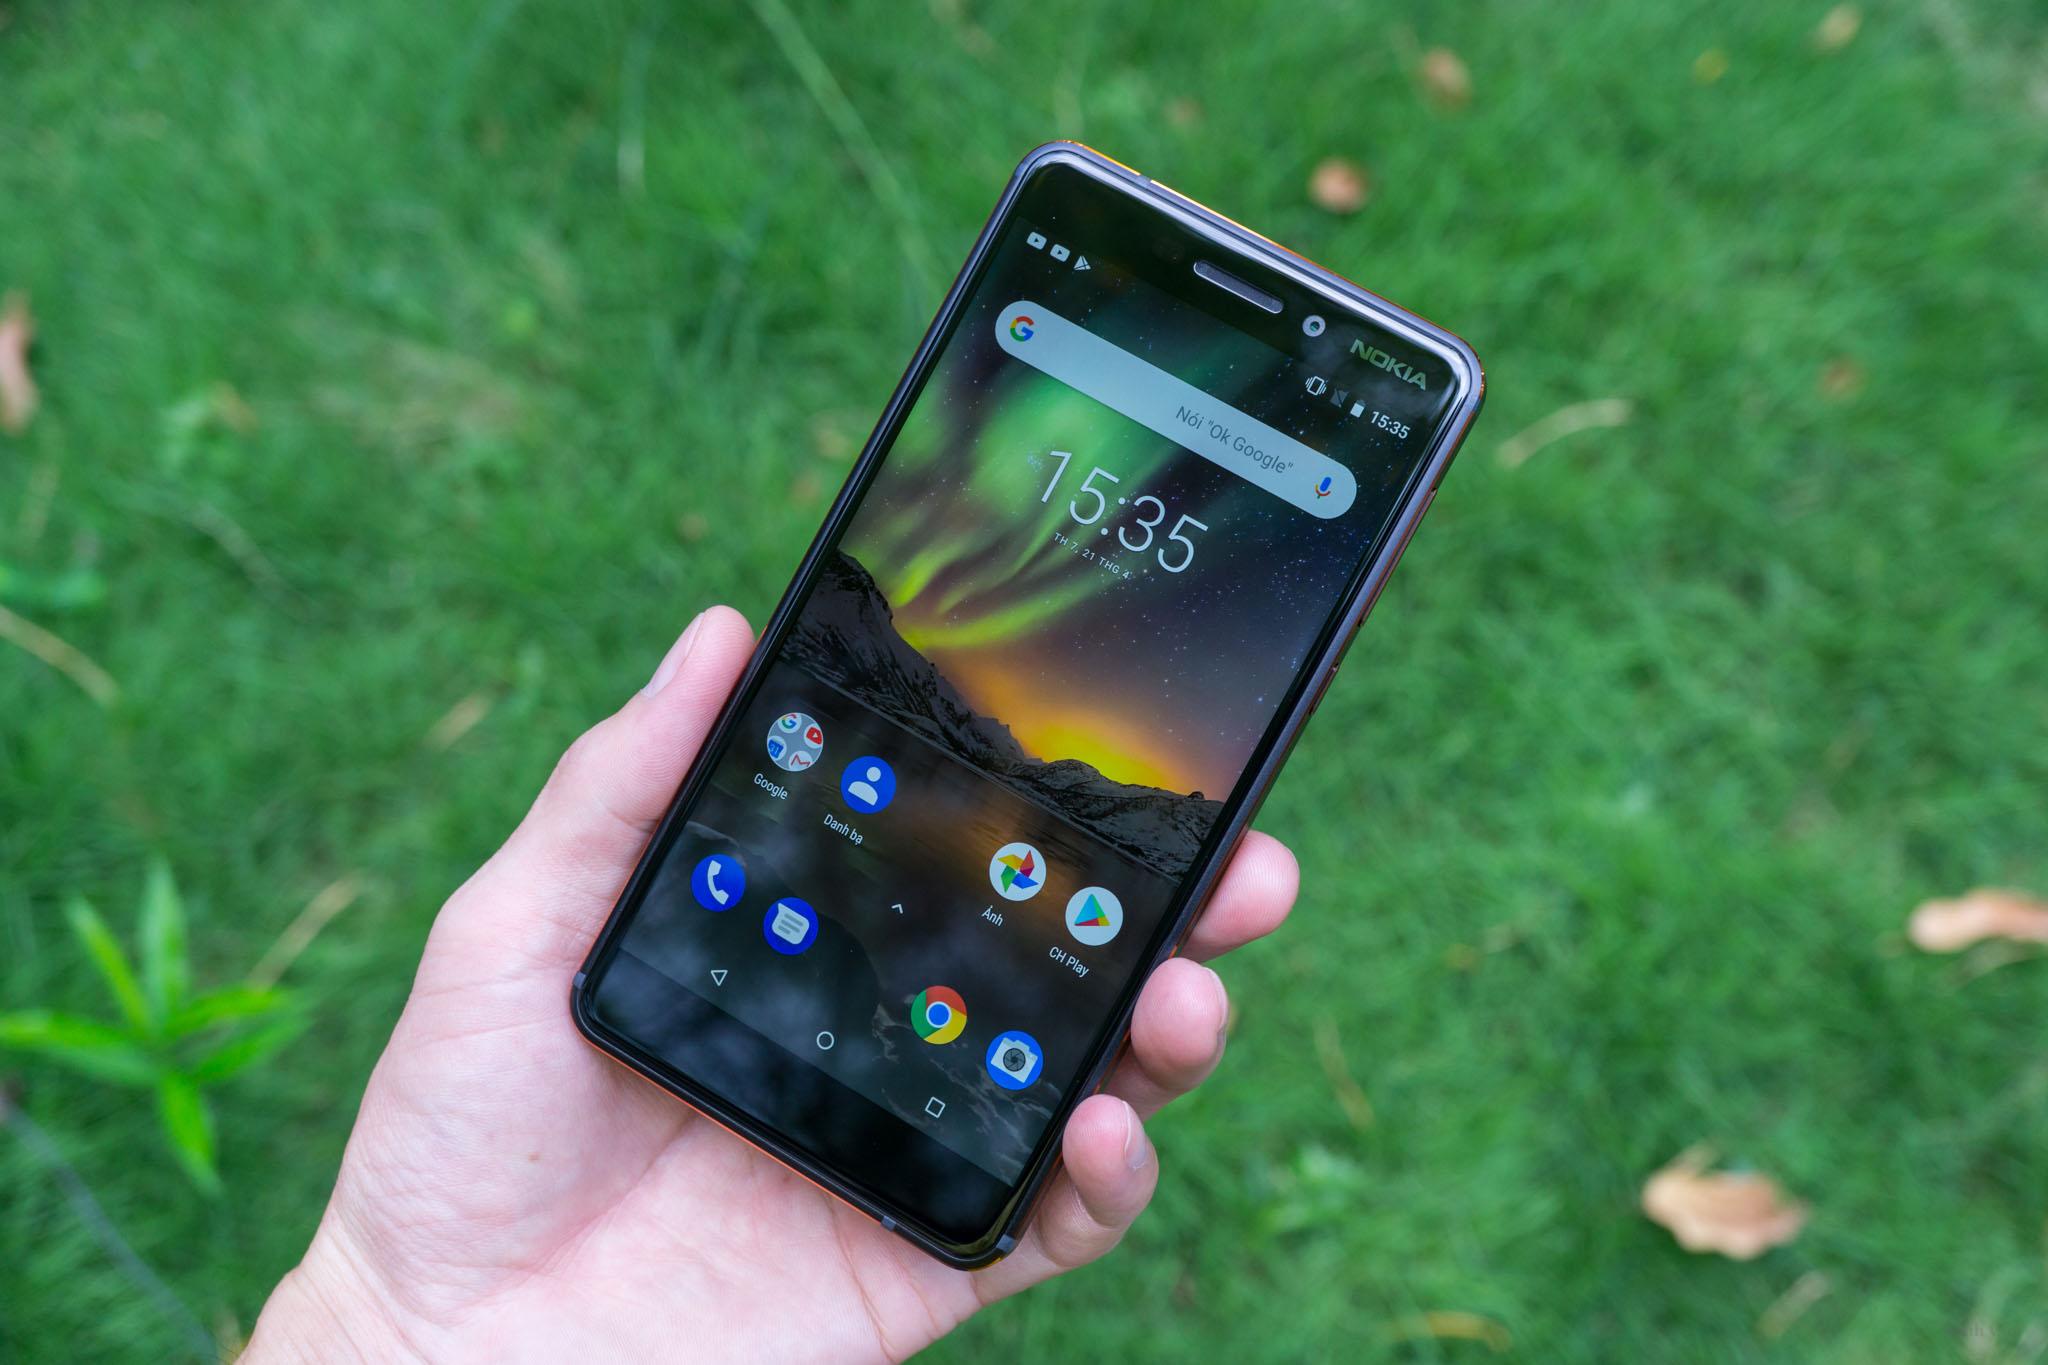 Nokia 6 mới_-30.jpg